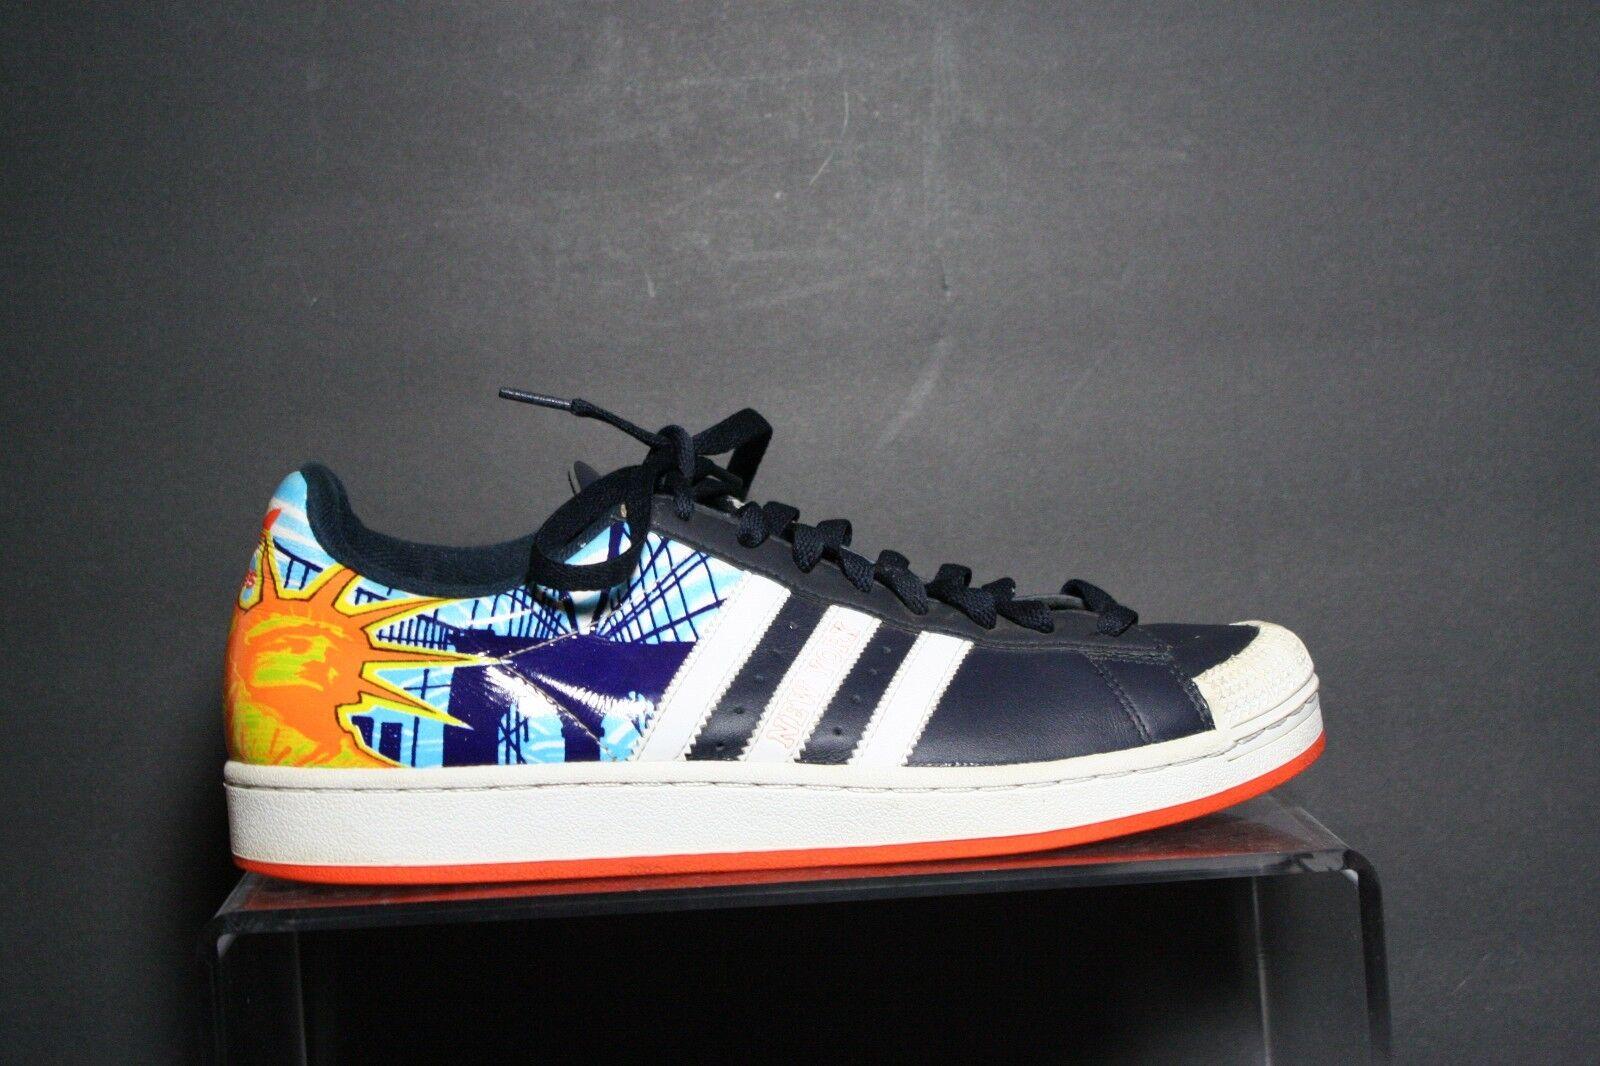 Adidas Half Shell New York NYC 06' Sneaker Ath Multi Sz 11 Liberty Brooklyn Hip